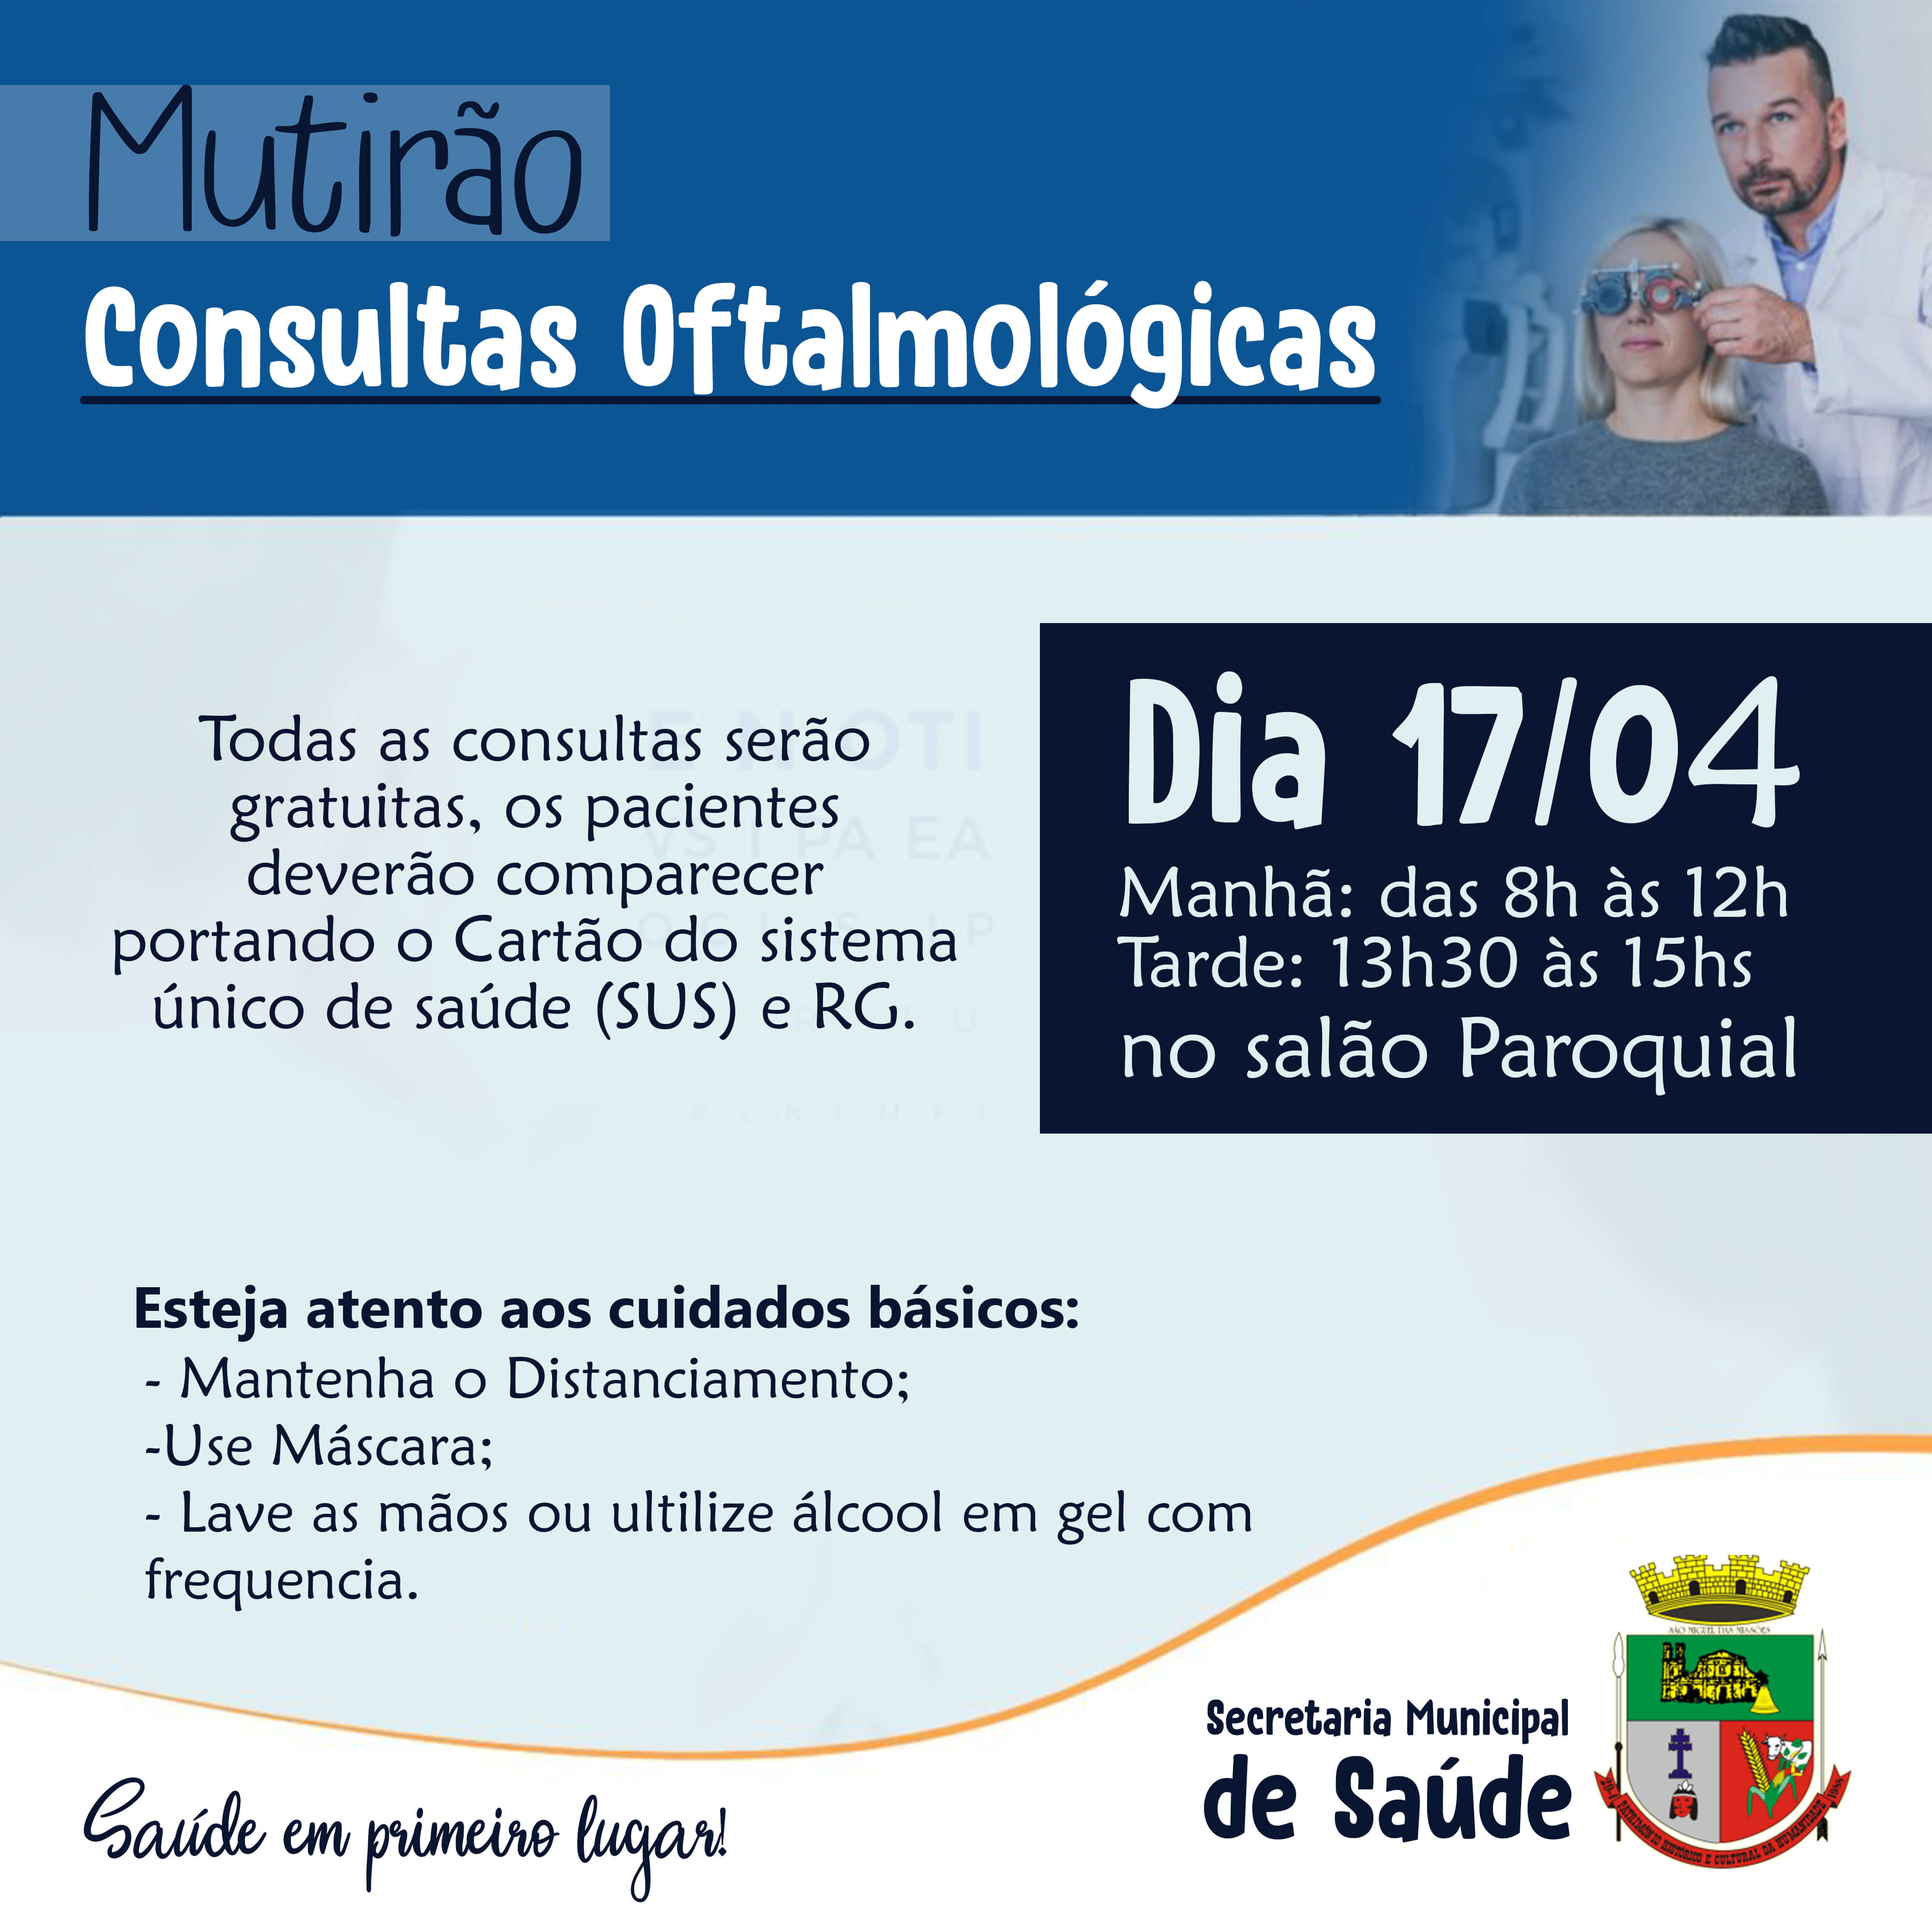 Consultas oftalmológicas